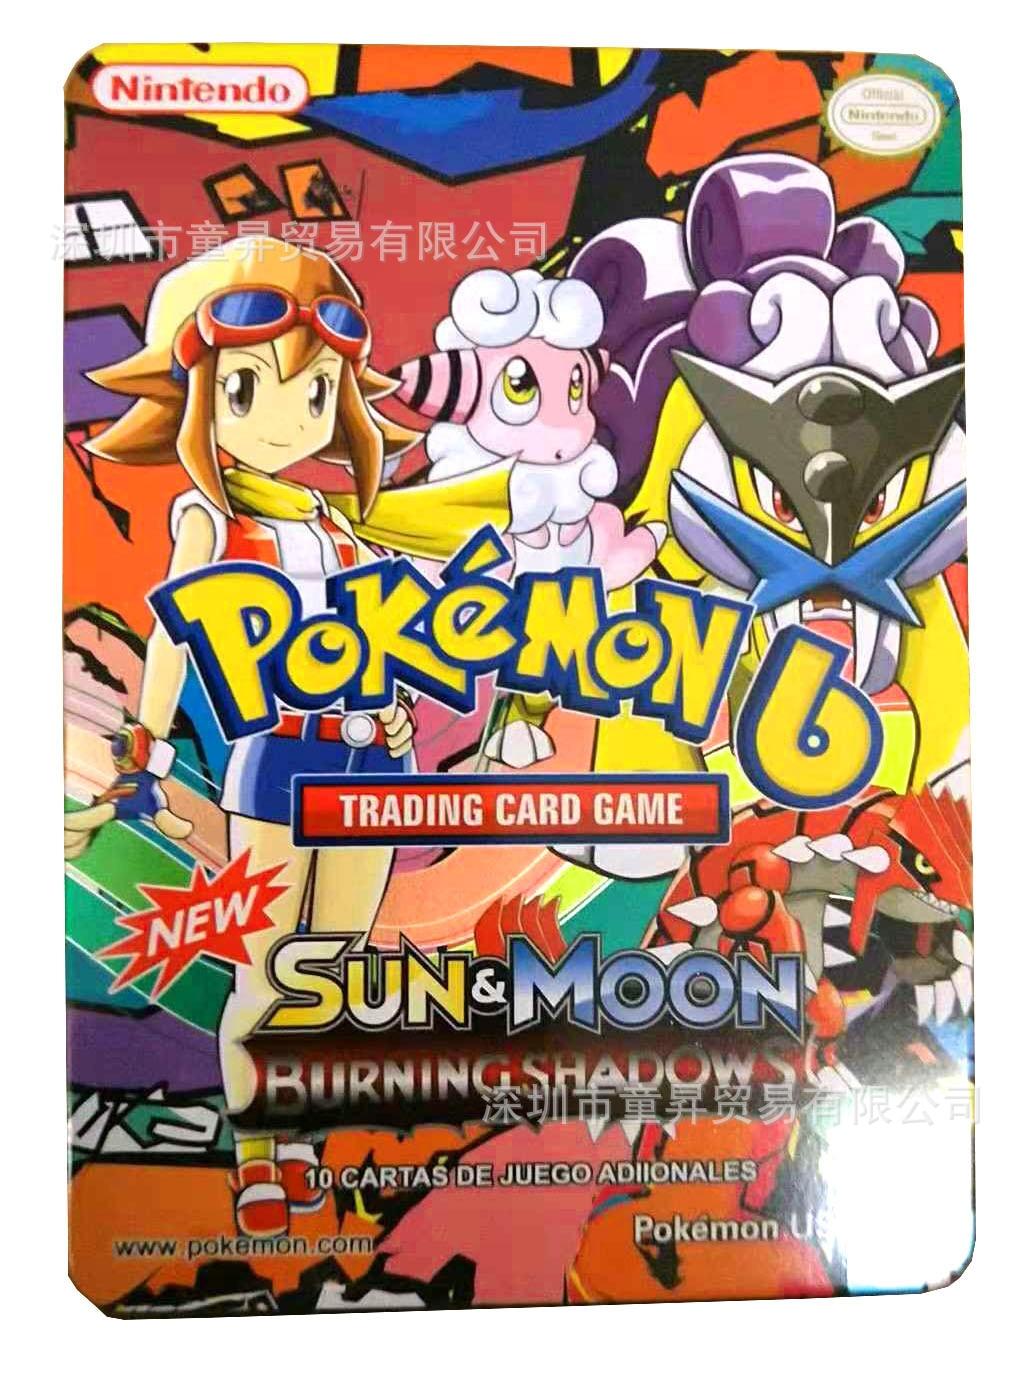 sticker panini 10517697 boxing anime stickers children hobbies cards toy boys girls 70pcs/set Pokemon Big Box 15MC*20.5CM TAKARA TOMY Toys Hobbies Hobby Collectibles Game Collection Anime Cards for Children